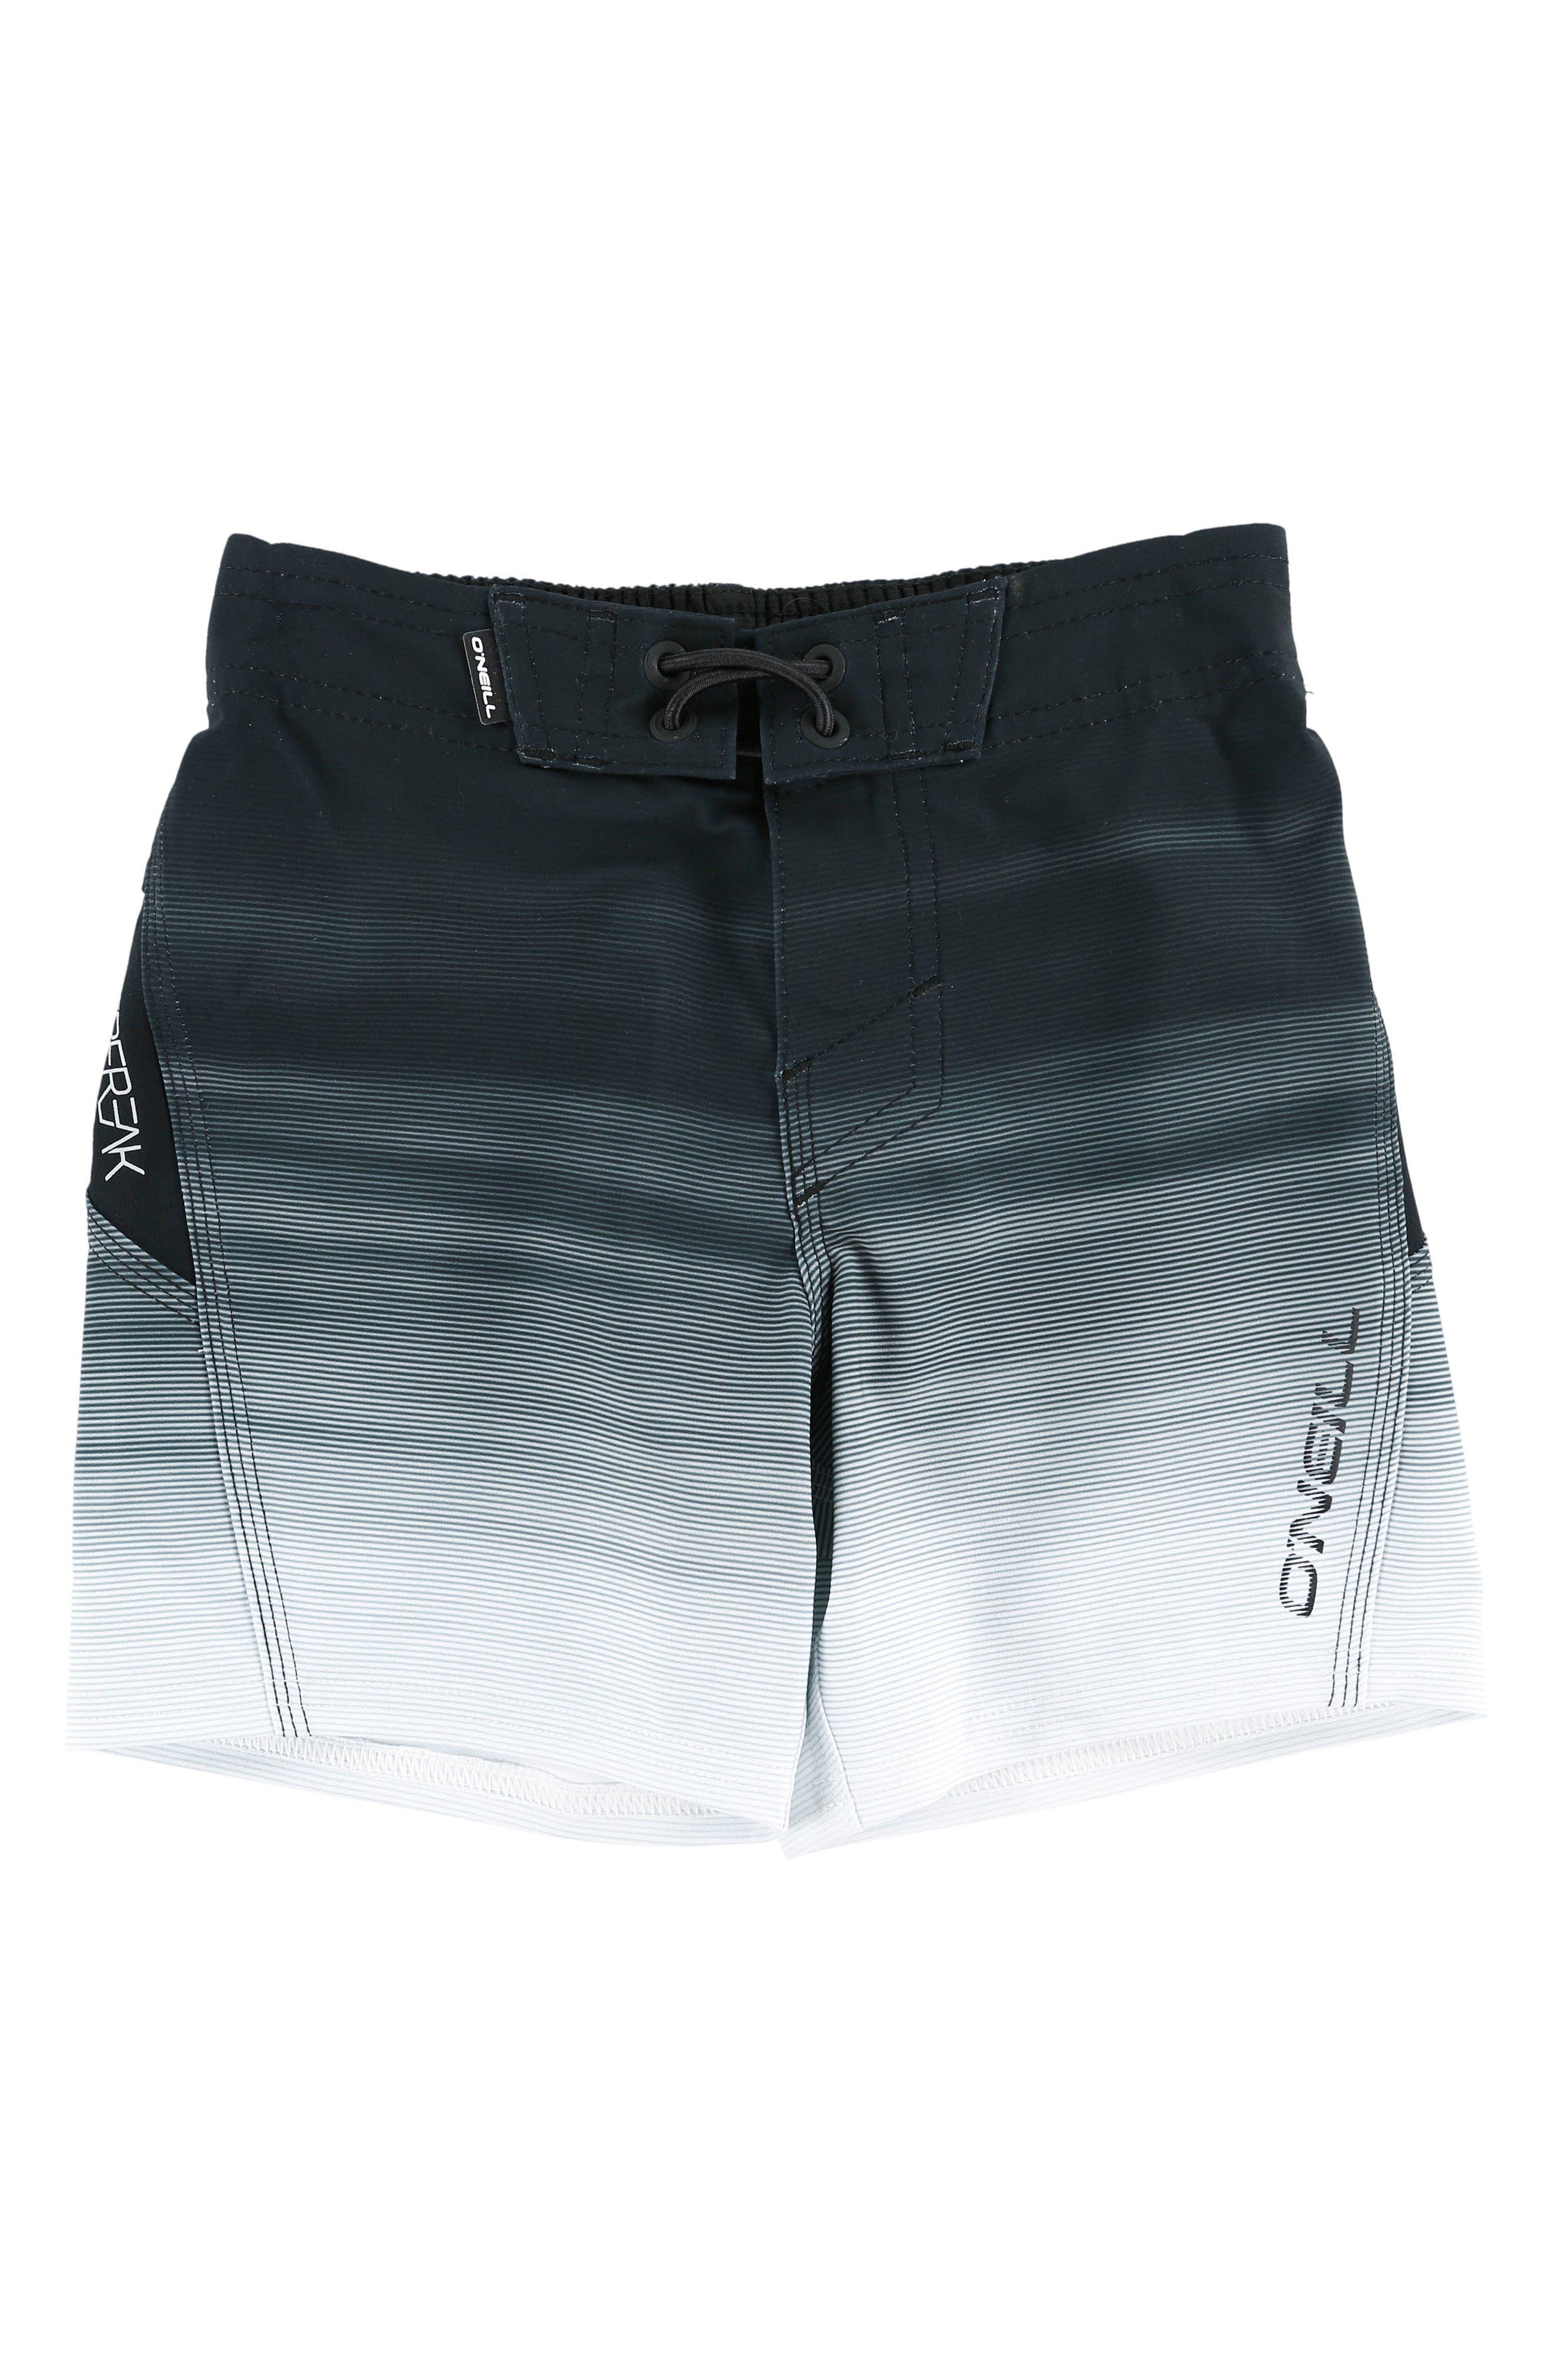 Sneakyfreak Mysto Board Shorts,                         Main,                         color, 001